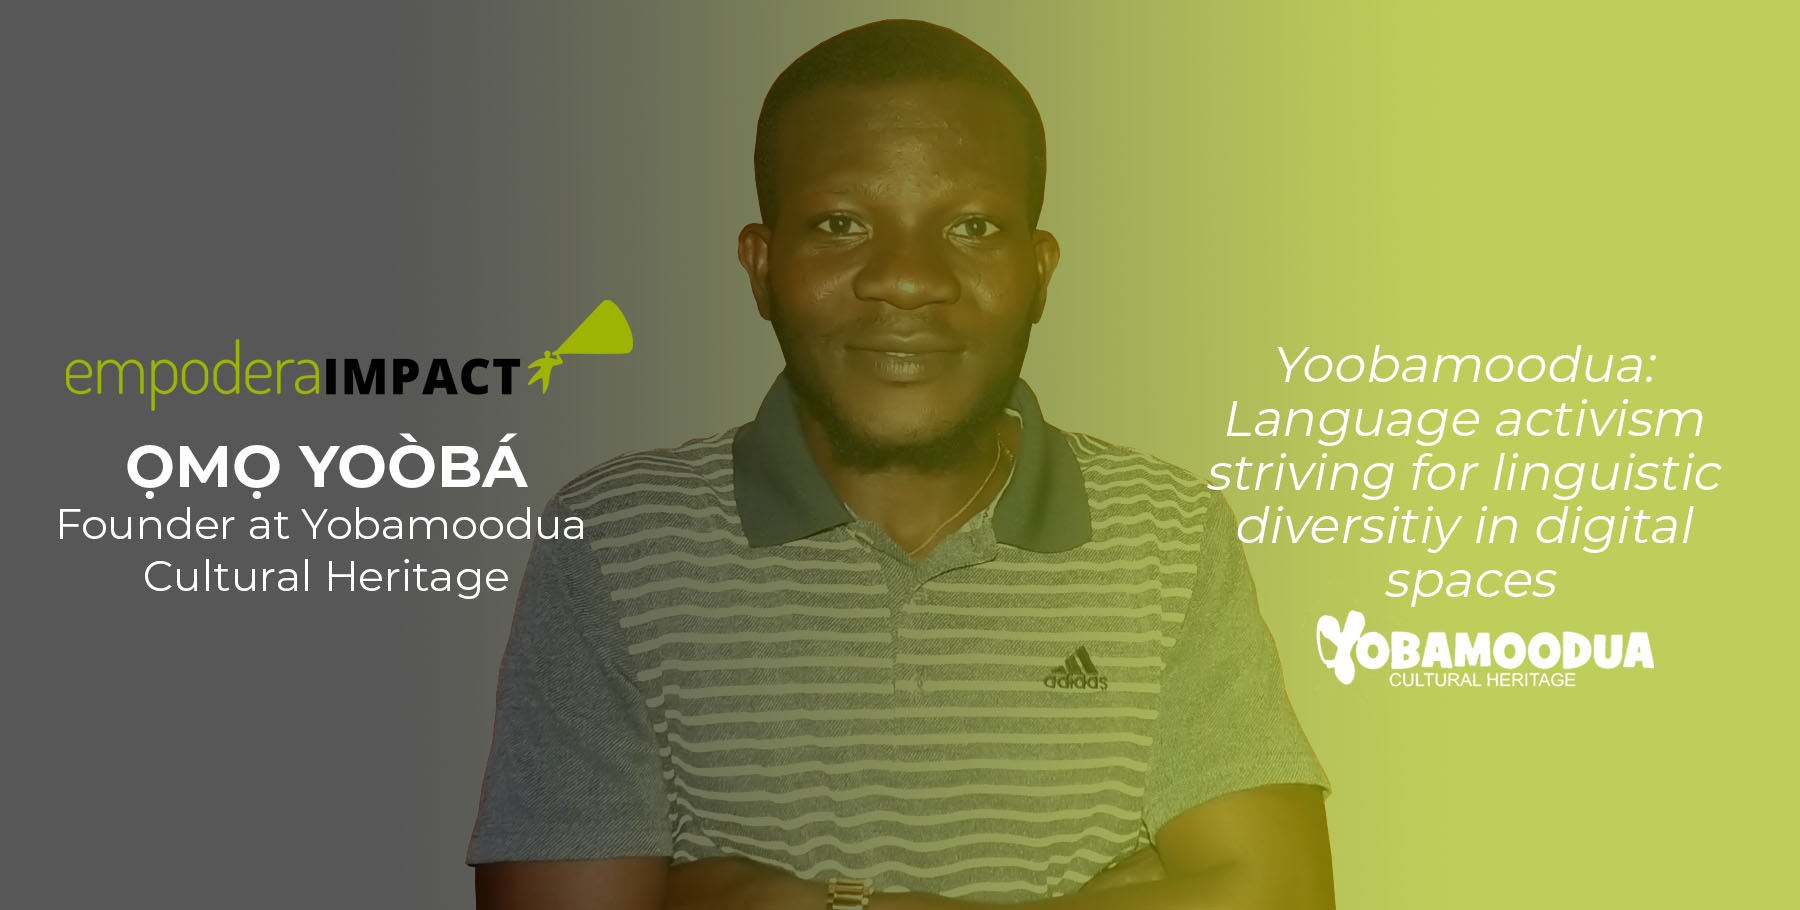 Yoobamoodua: Language activism striving for linguistic diversity in digital spaces